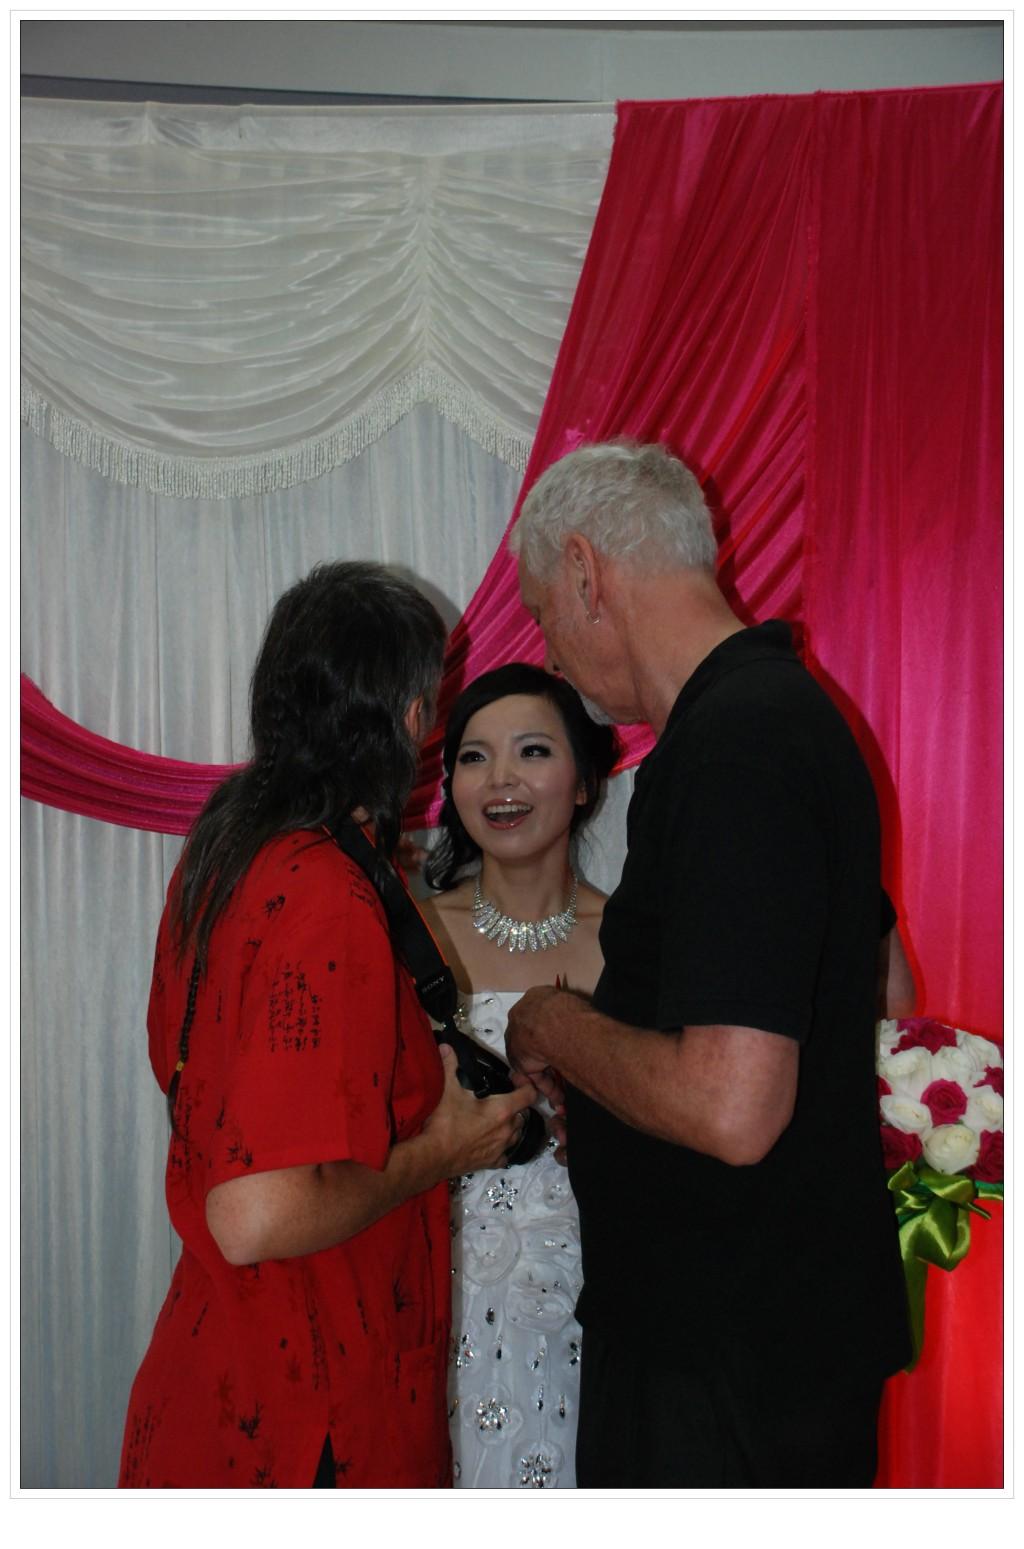 Picture:  David and Ruth at Jenny's wedding. Shanghai, China